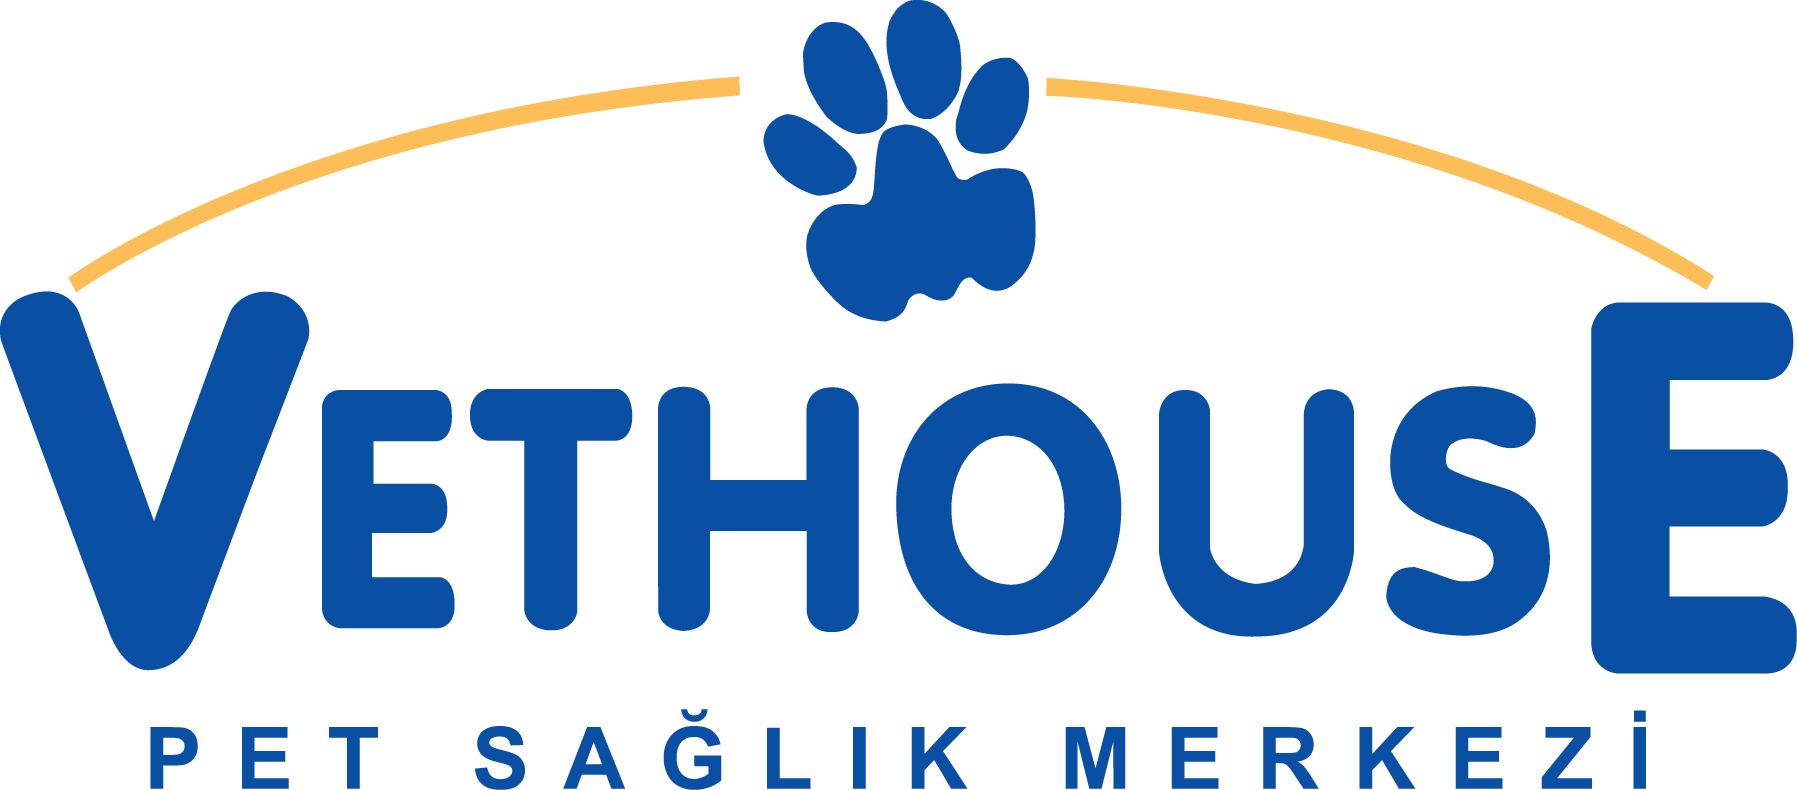 Vethouse Veteriner Kliniği